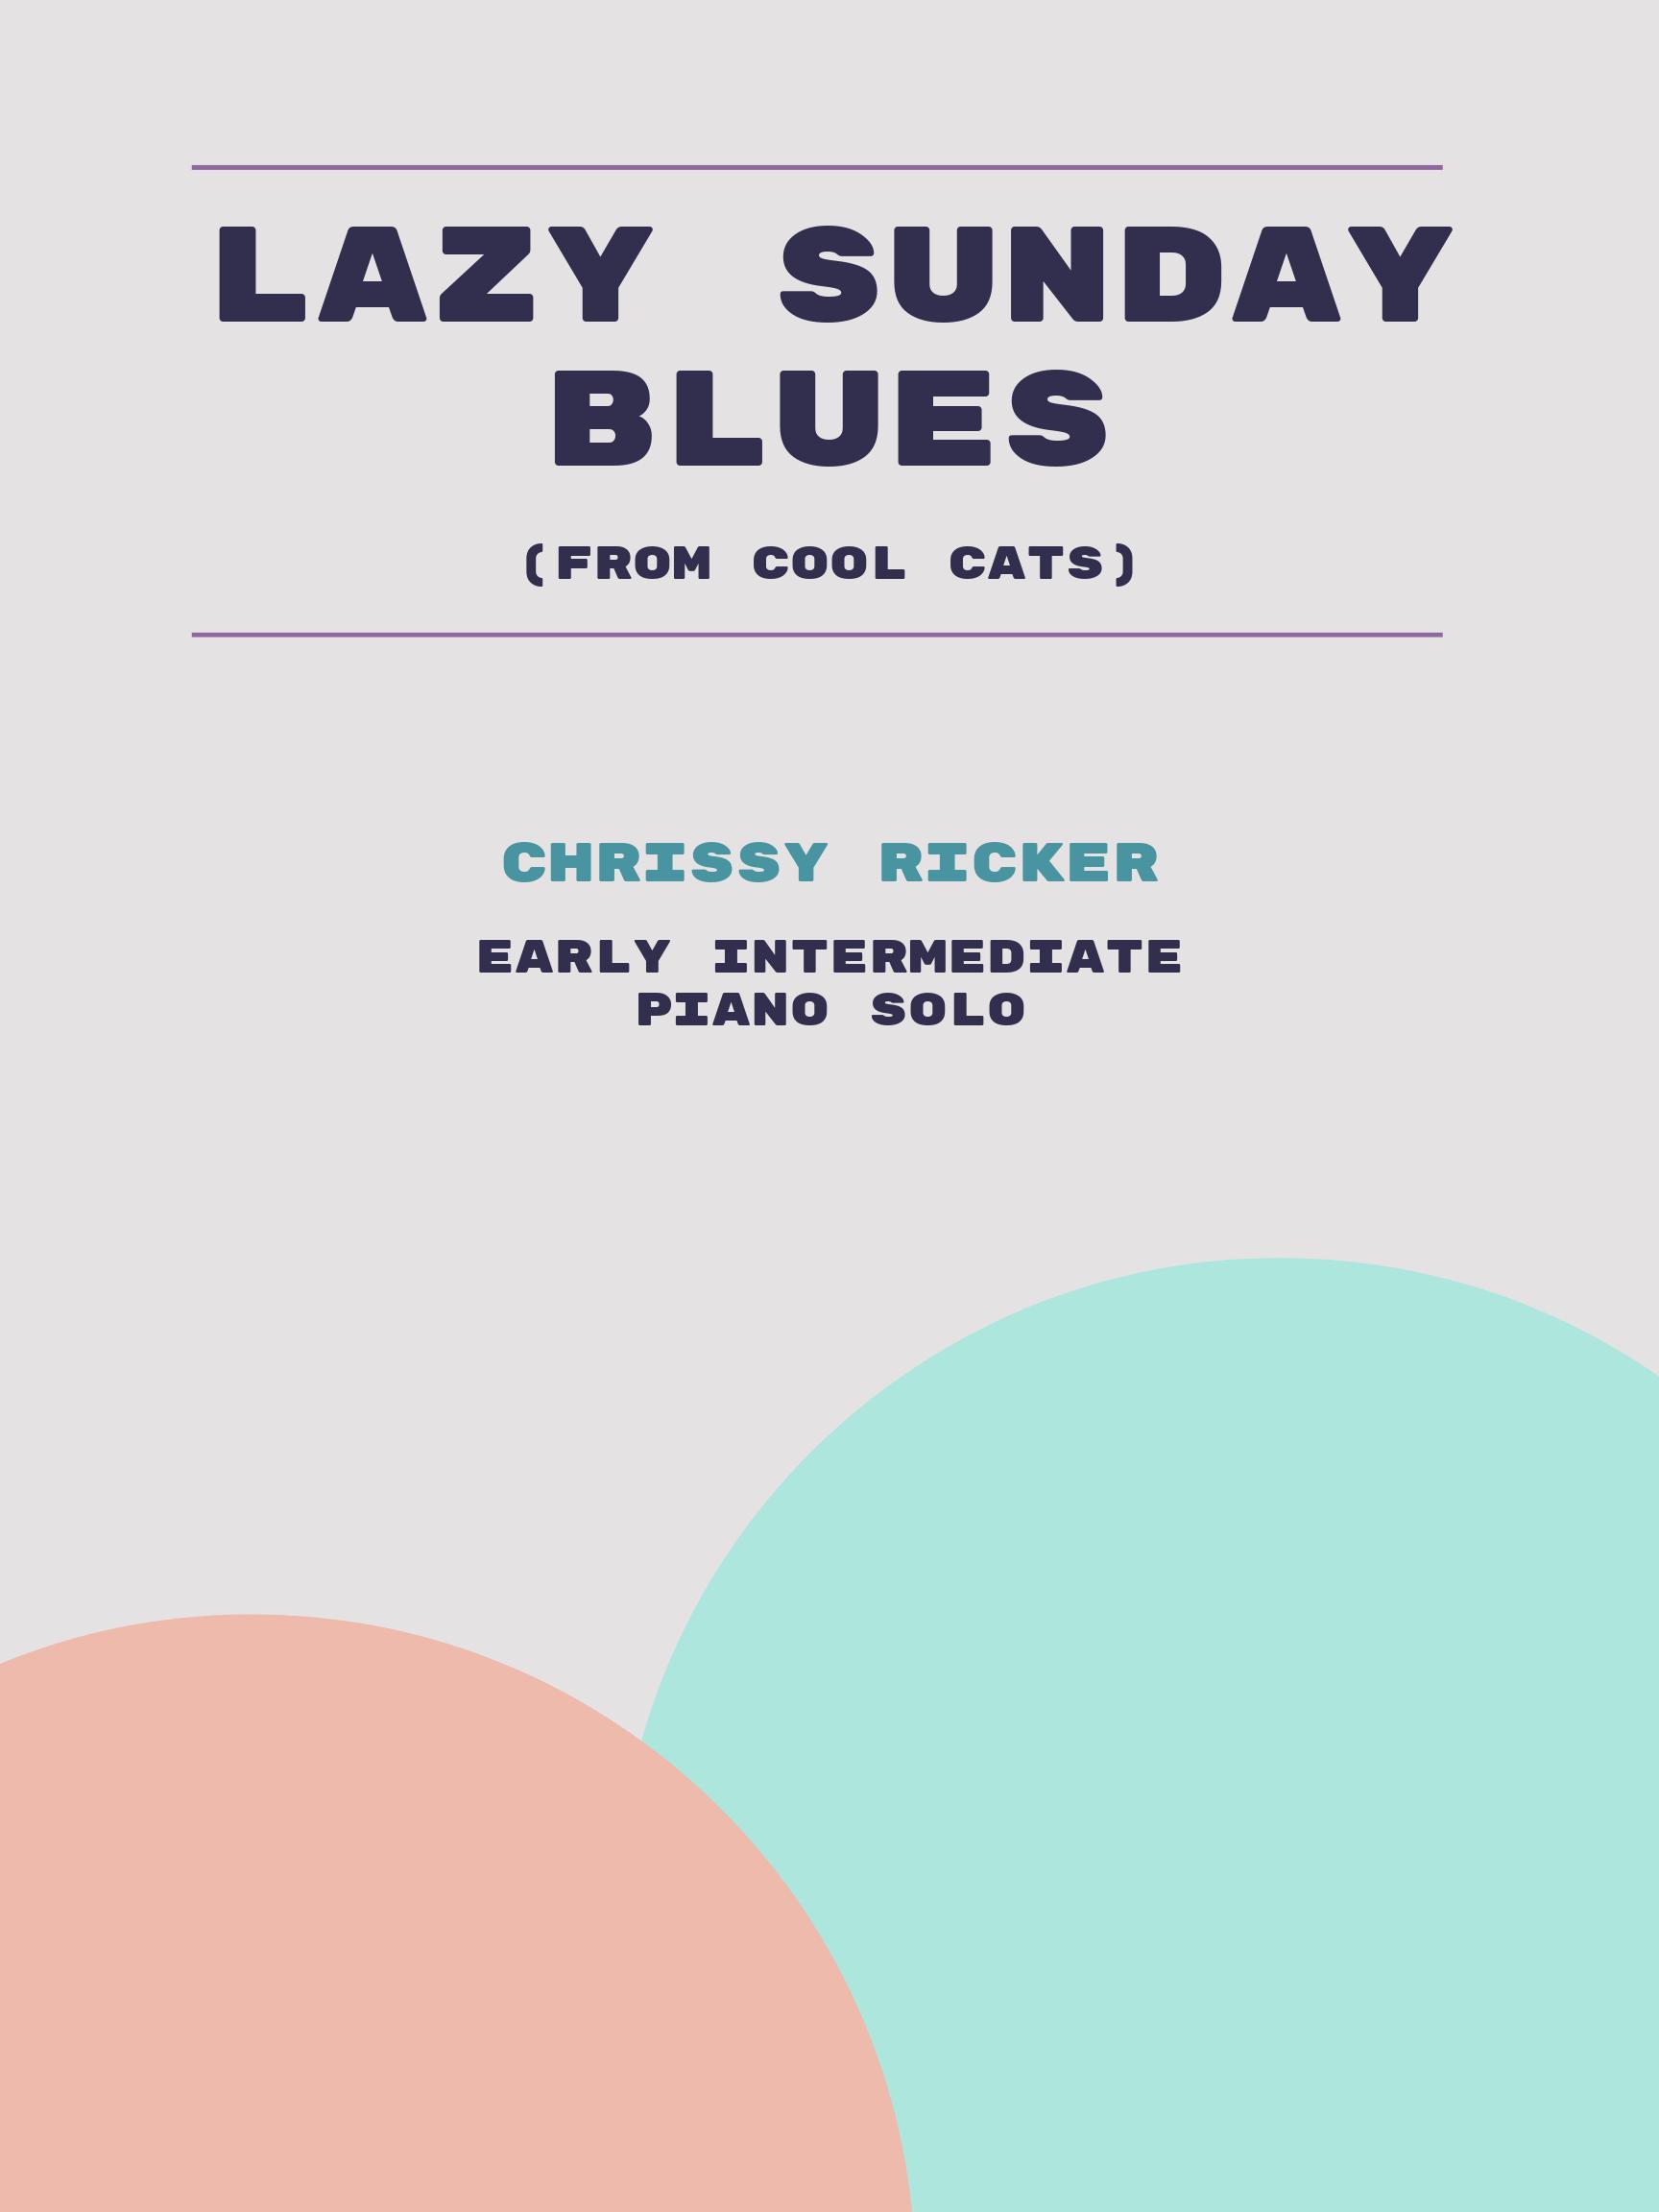 Lazy Sunday Blues by Chrissy Ricker